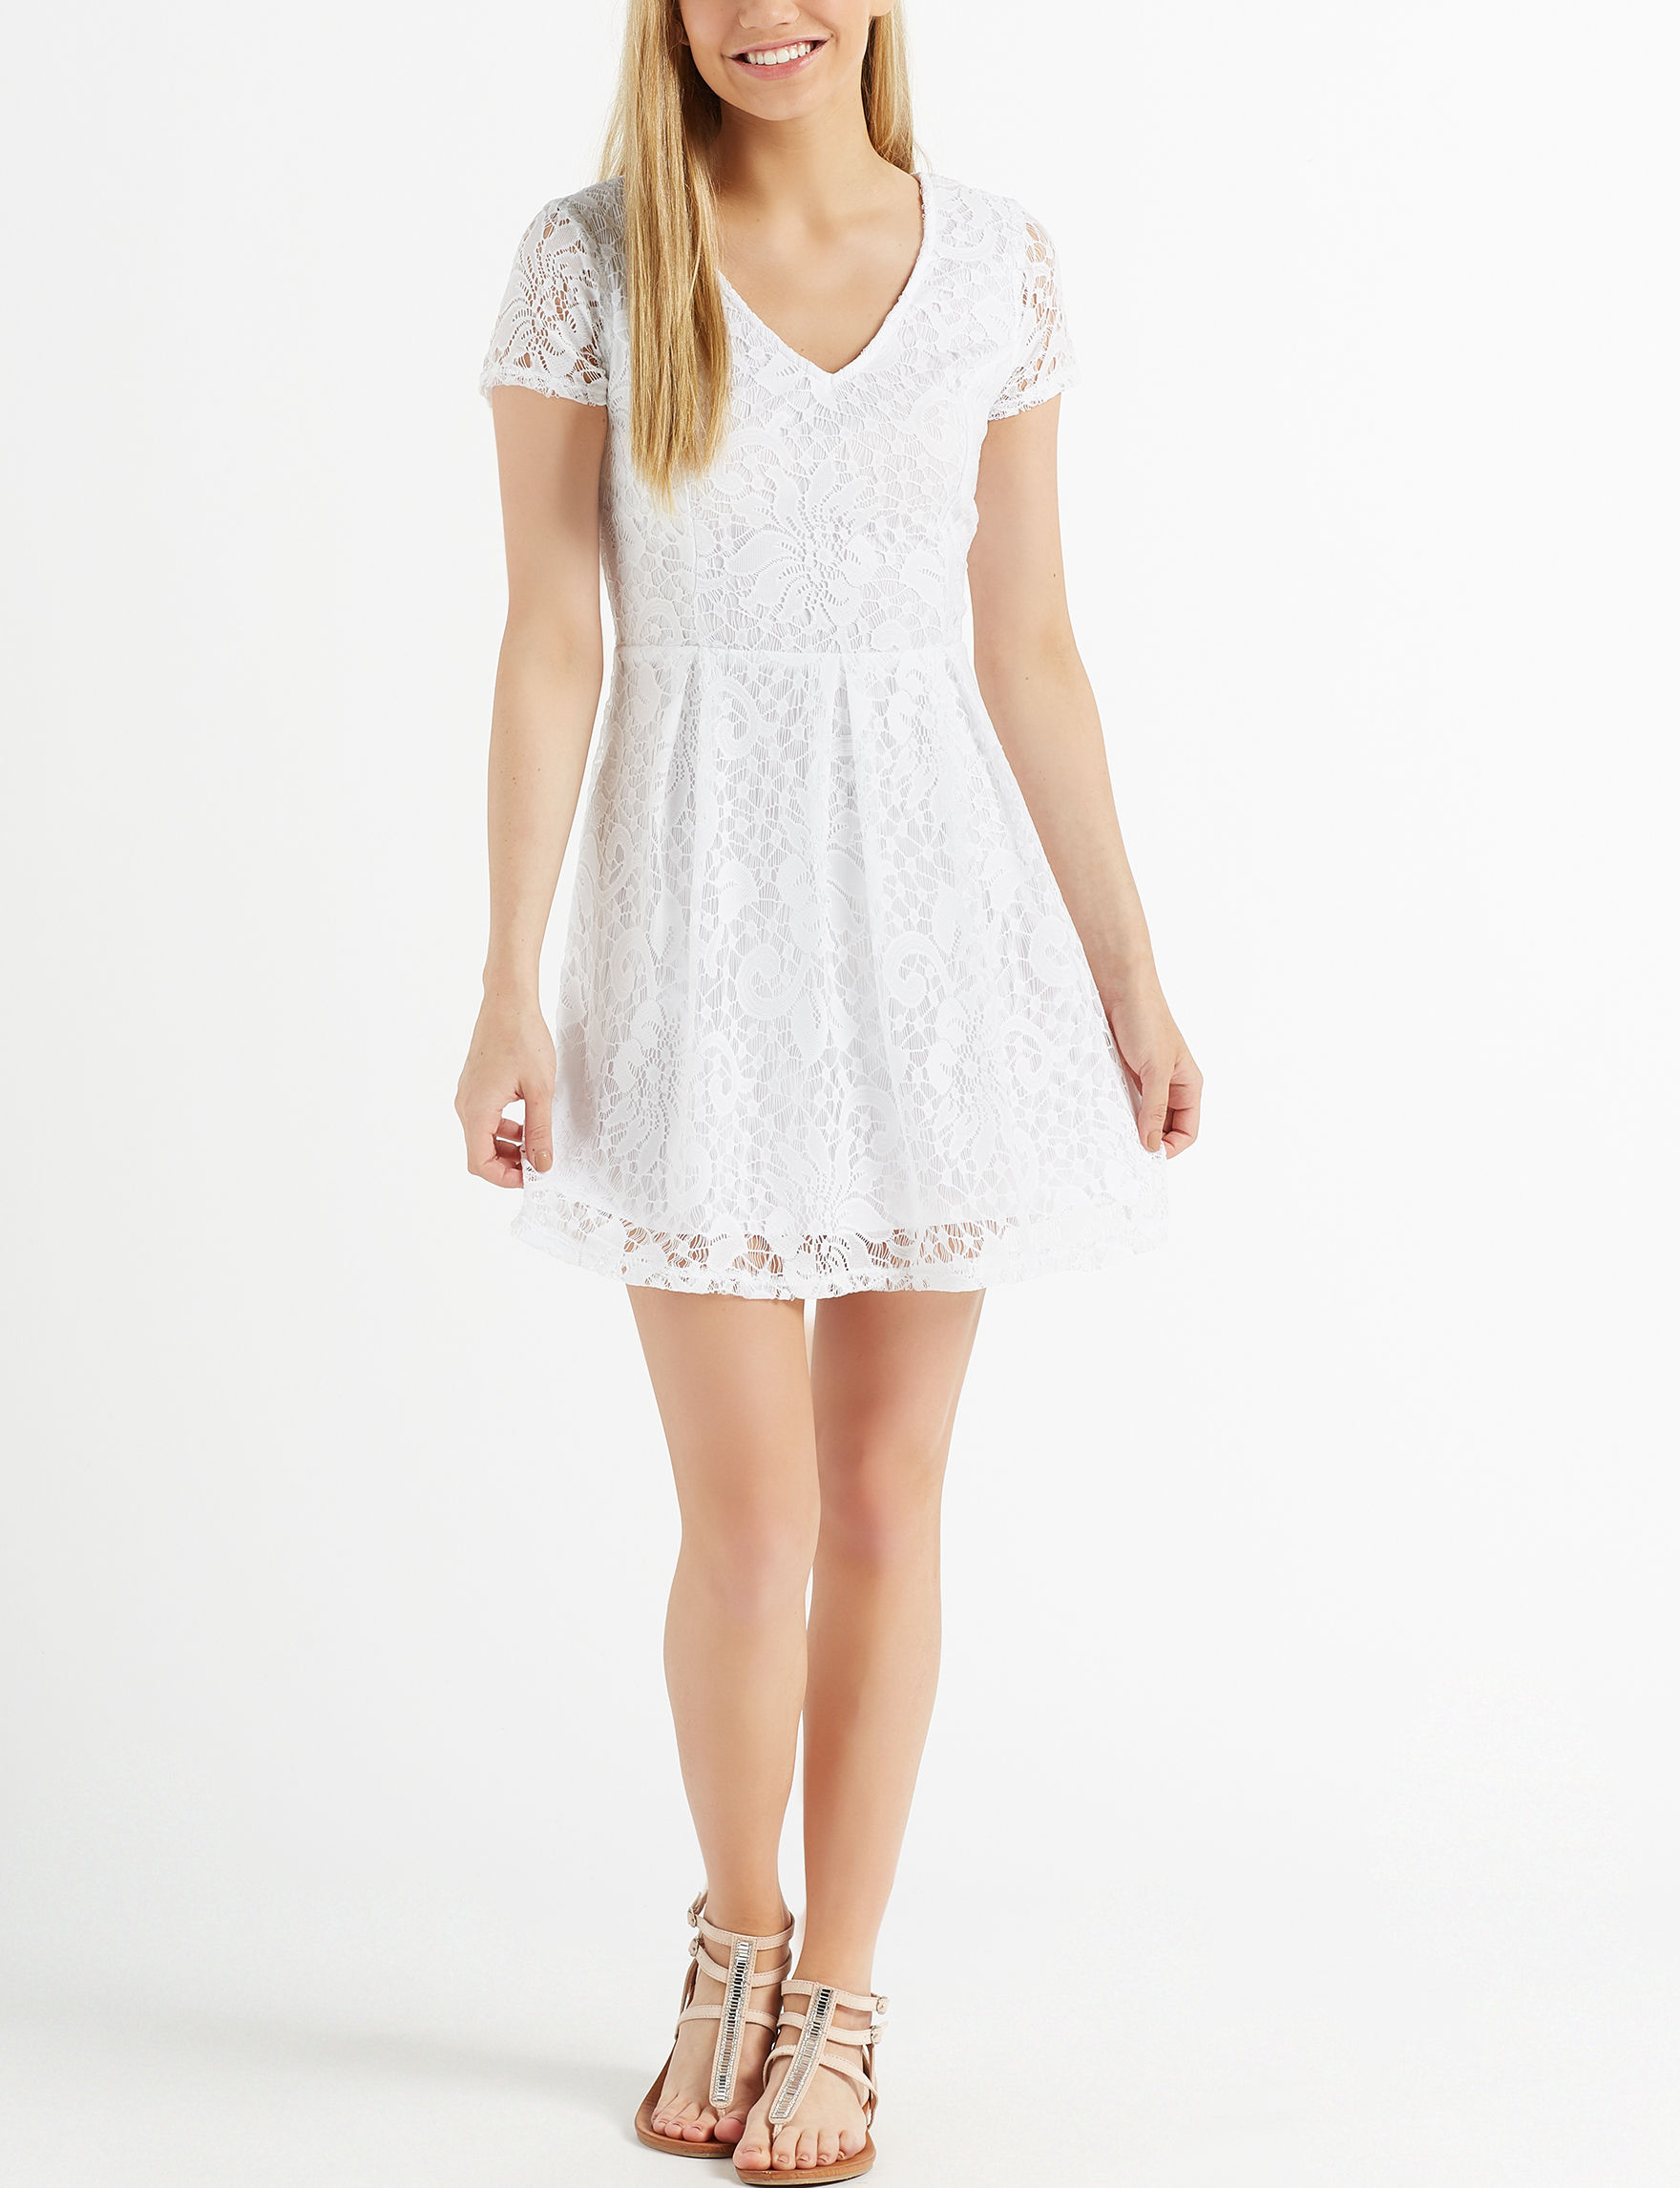 Speechless White Everyday & Casual Shift Dresses